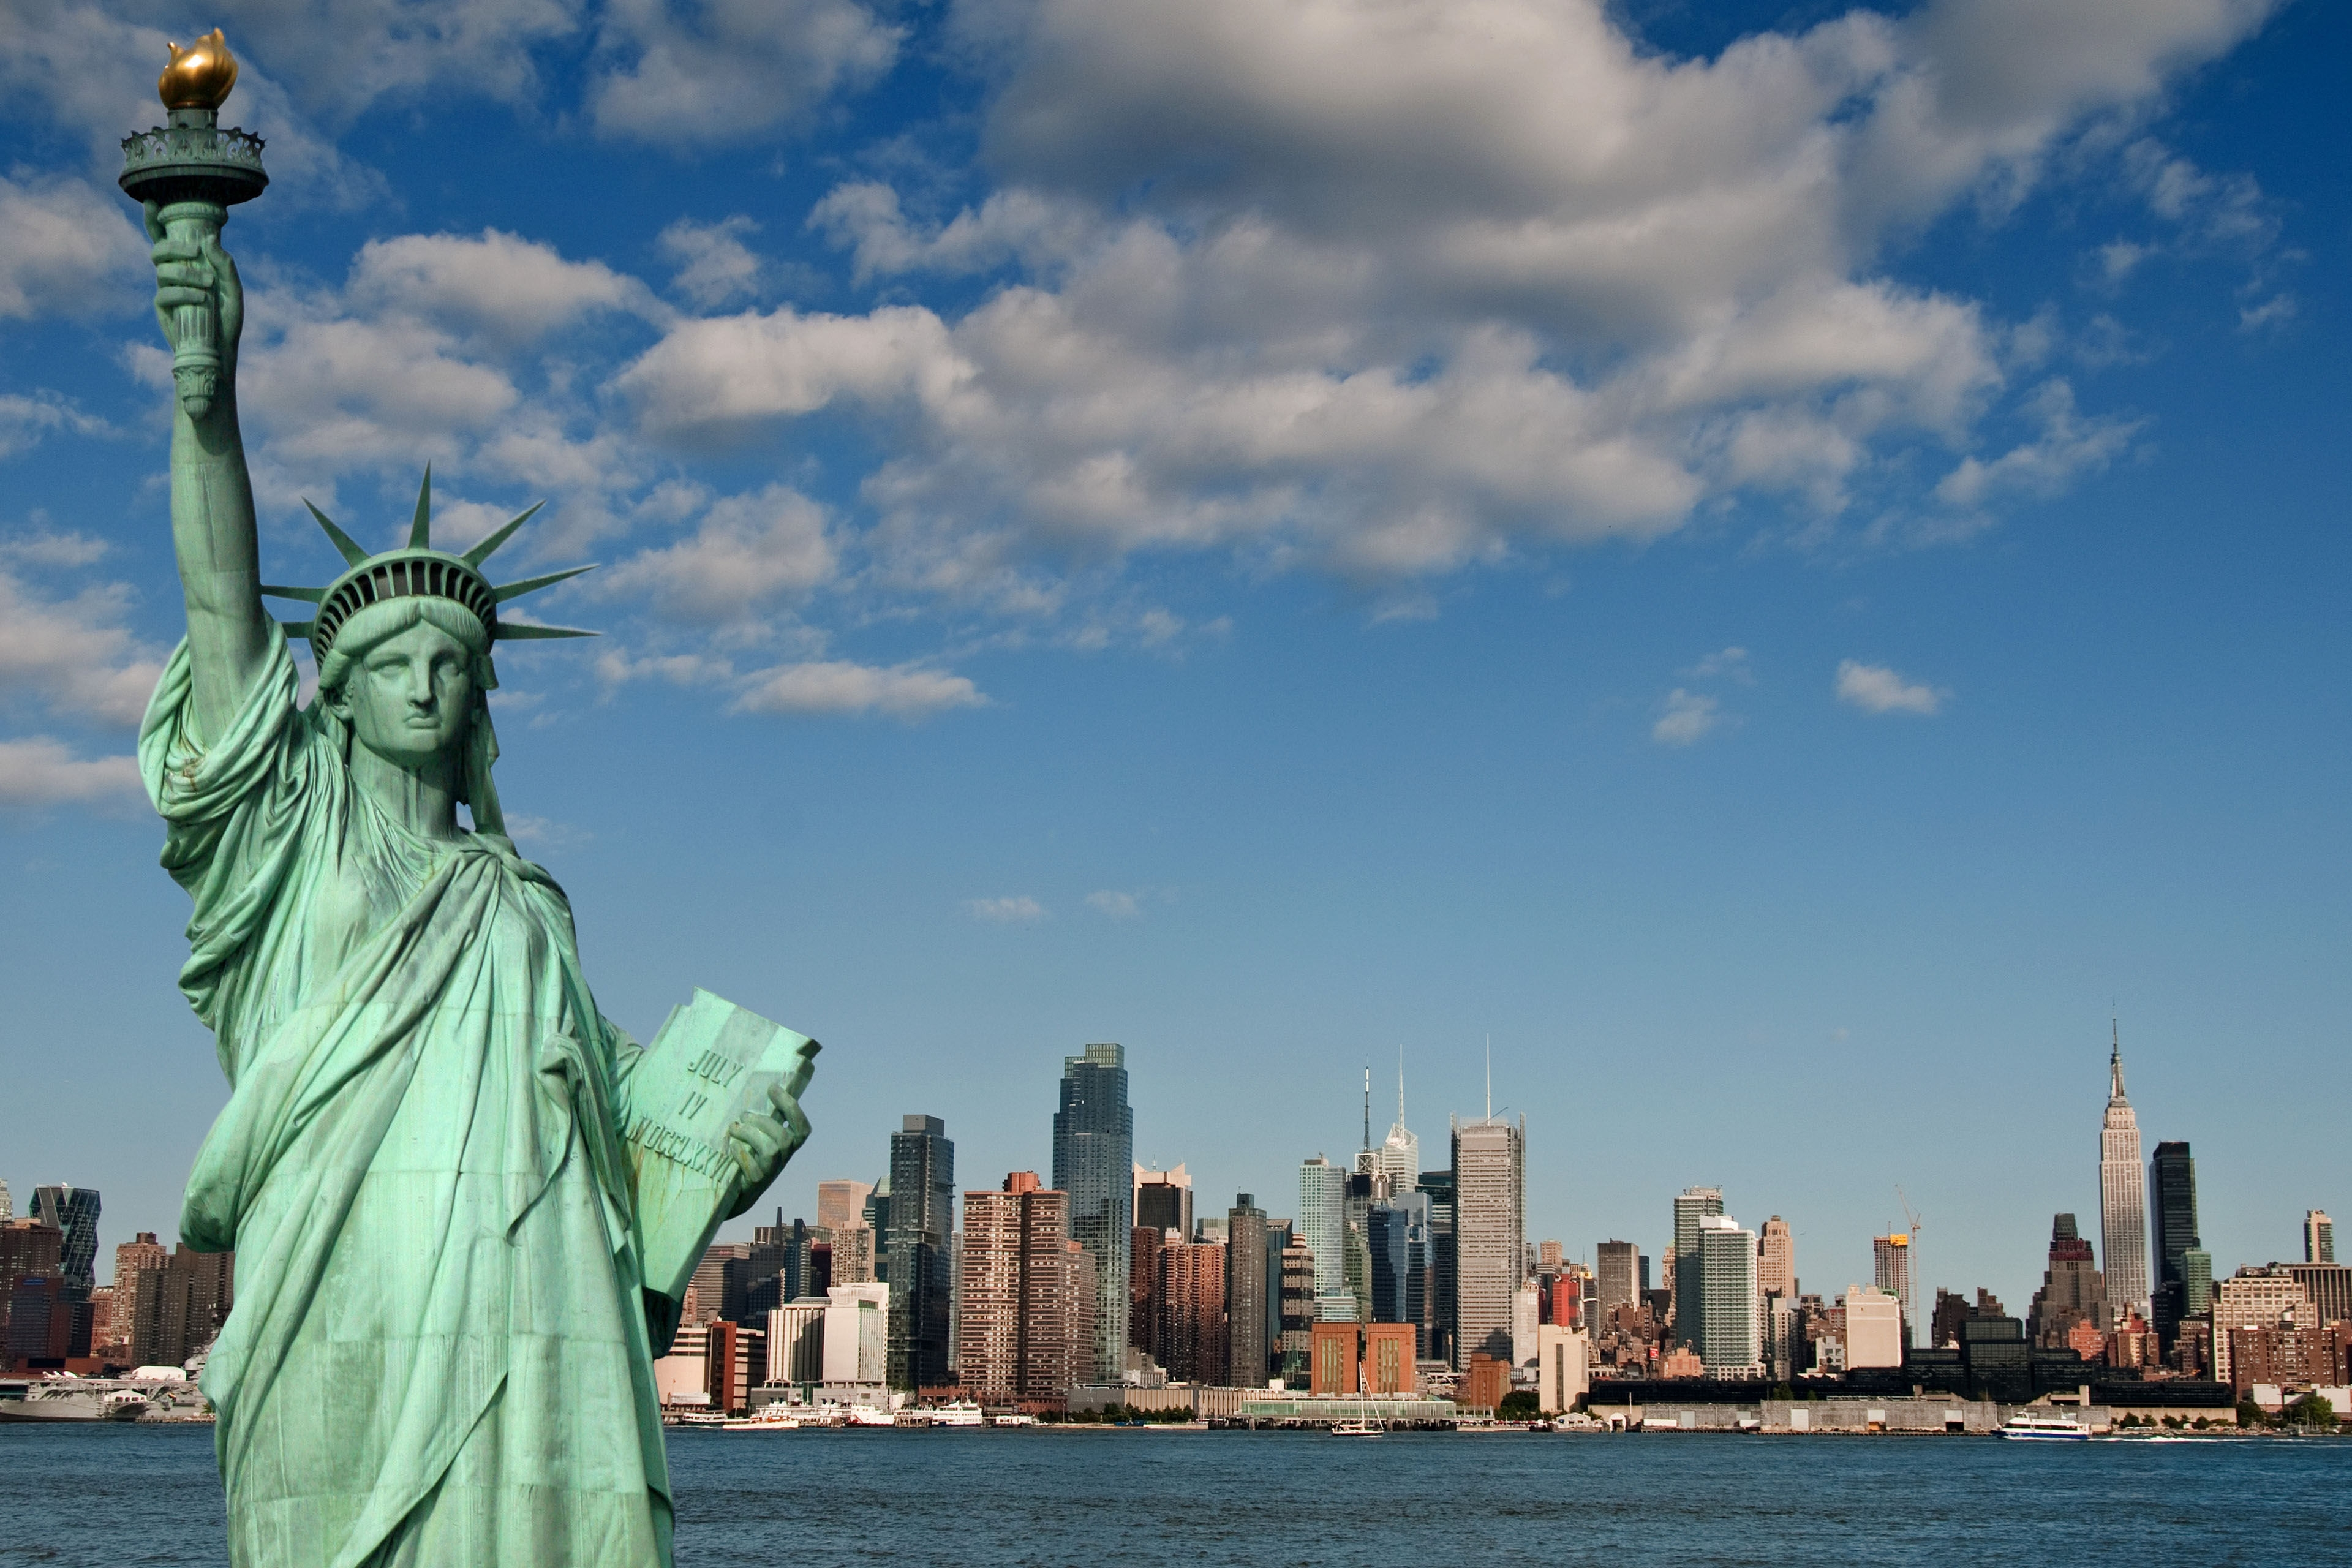 statue of liberty widescreen wallpaper 48969 3840x2560 px